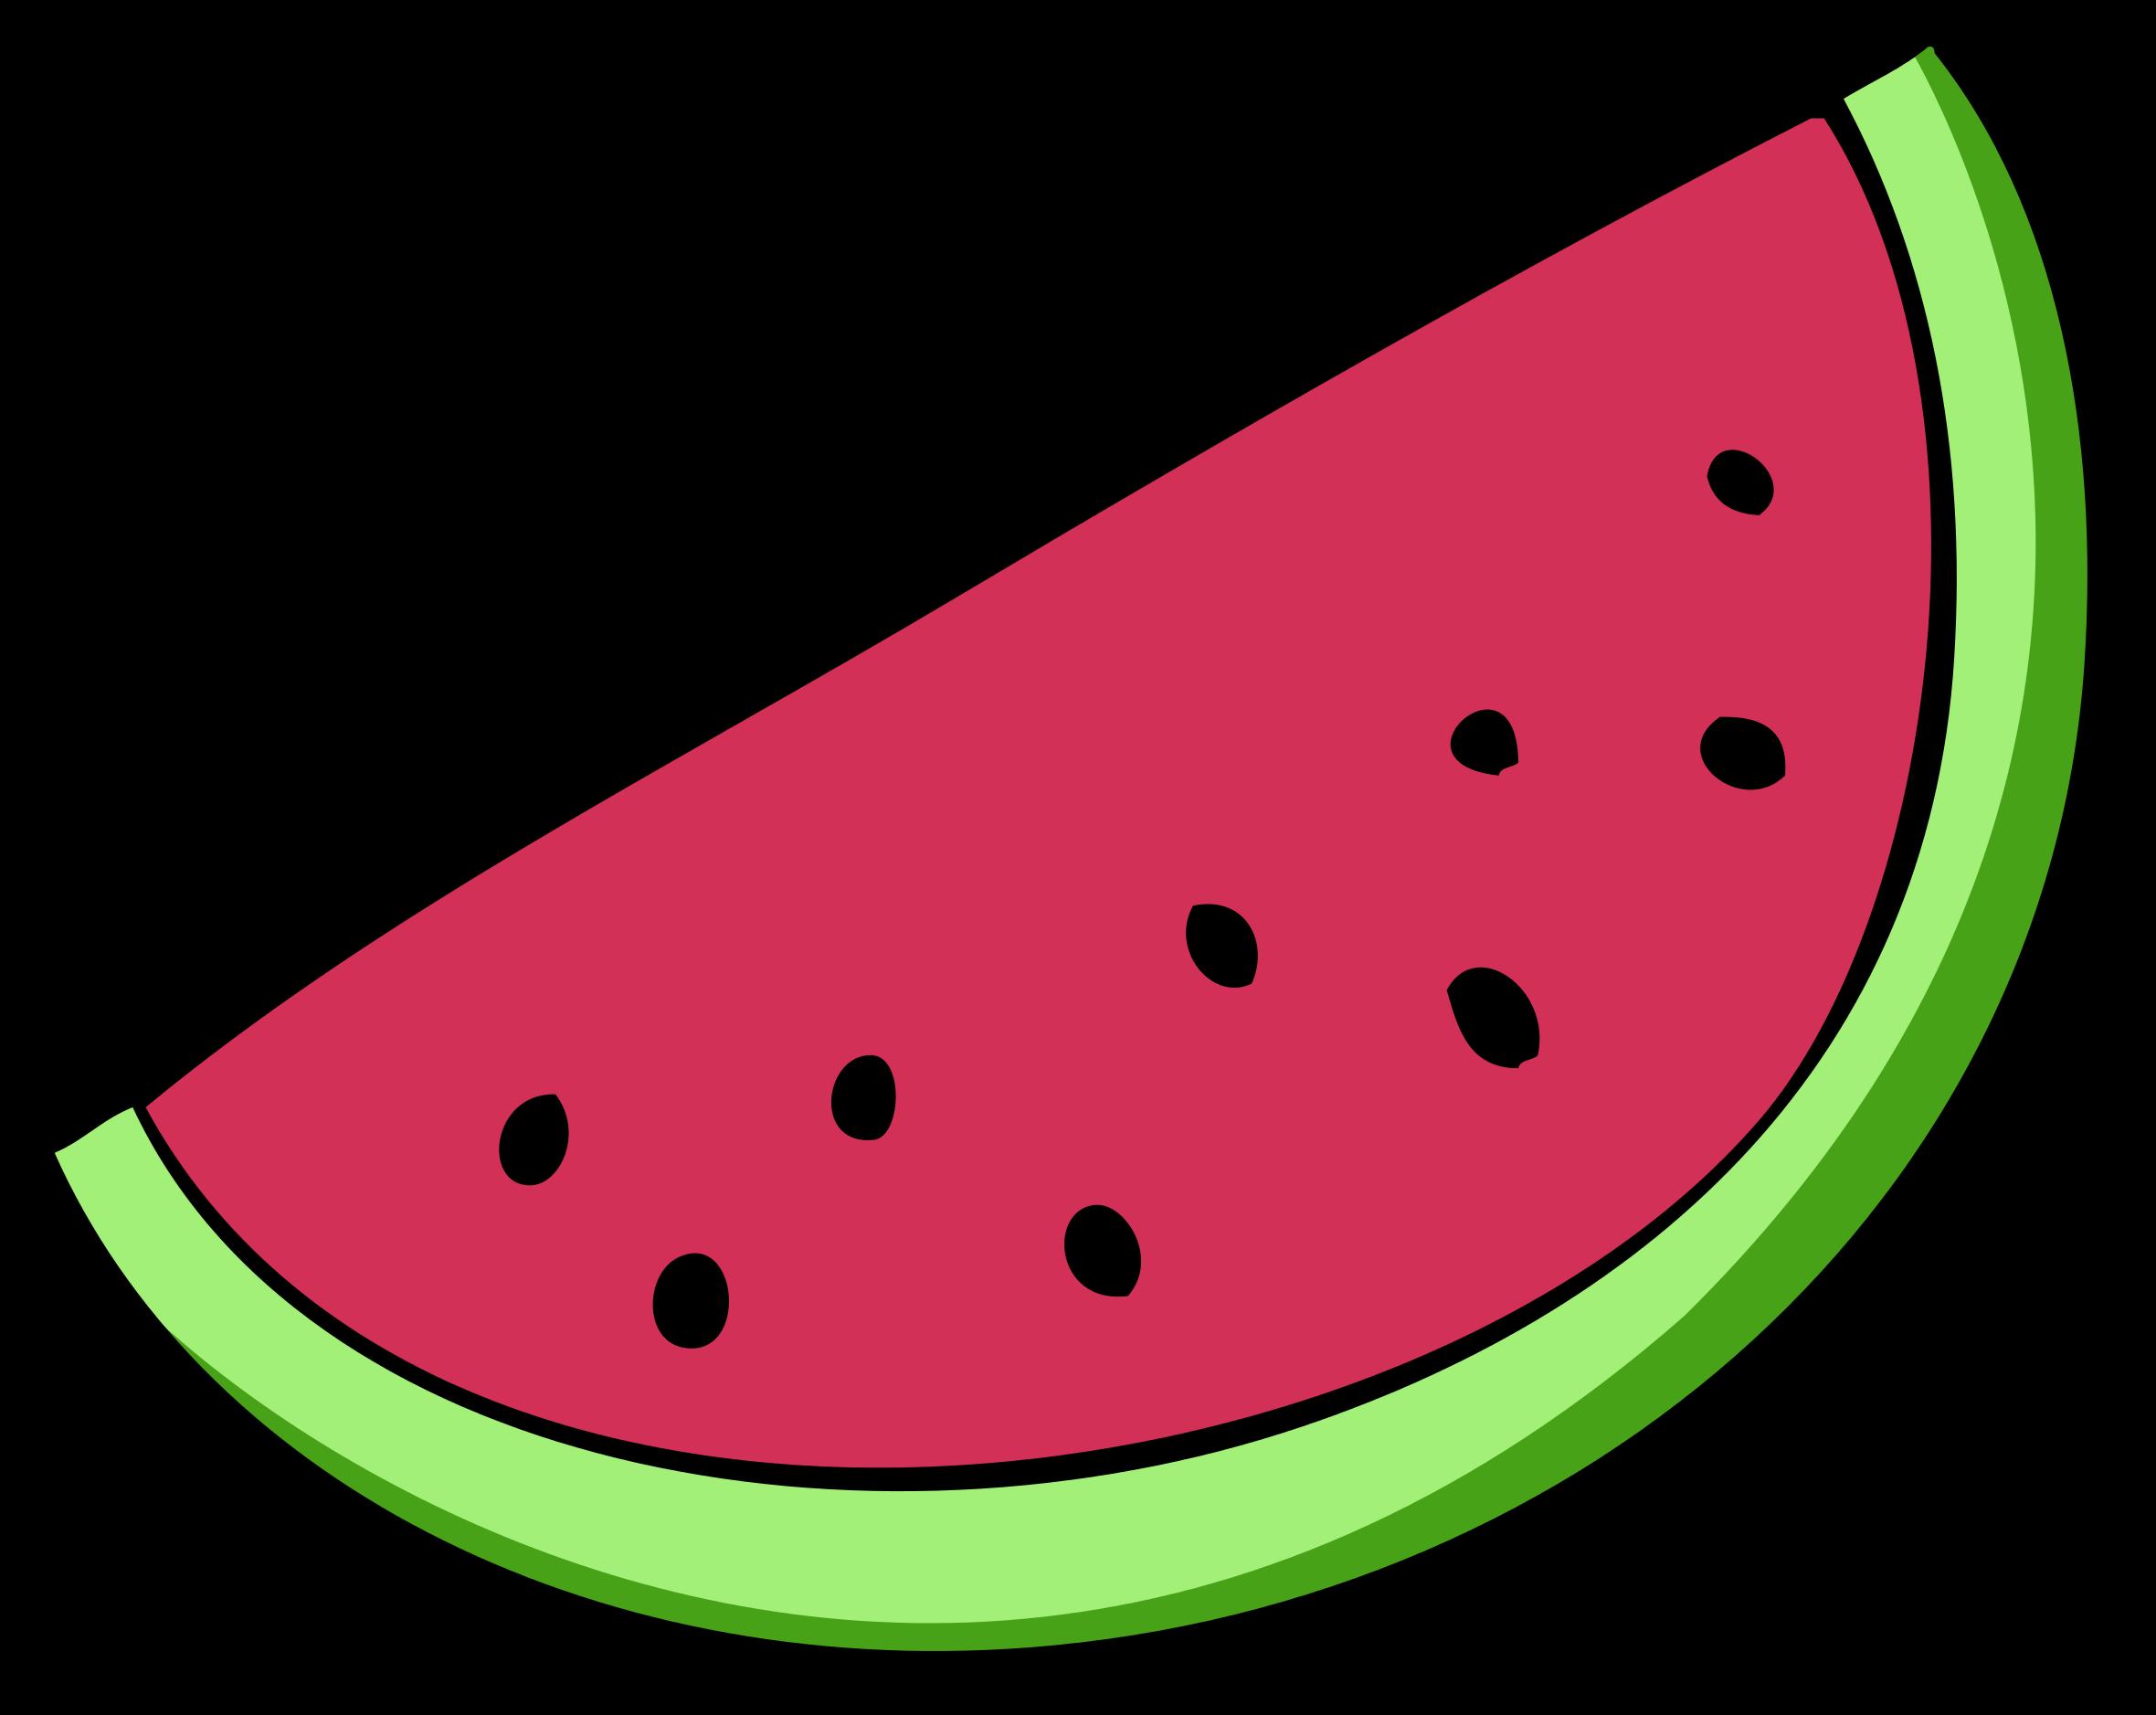 Watermelon Clip Art - Watermelon Clipart (2400x2400)